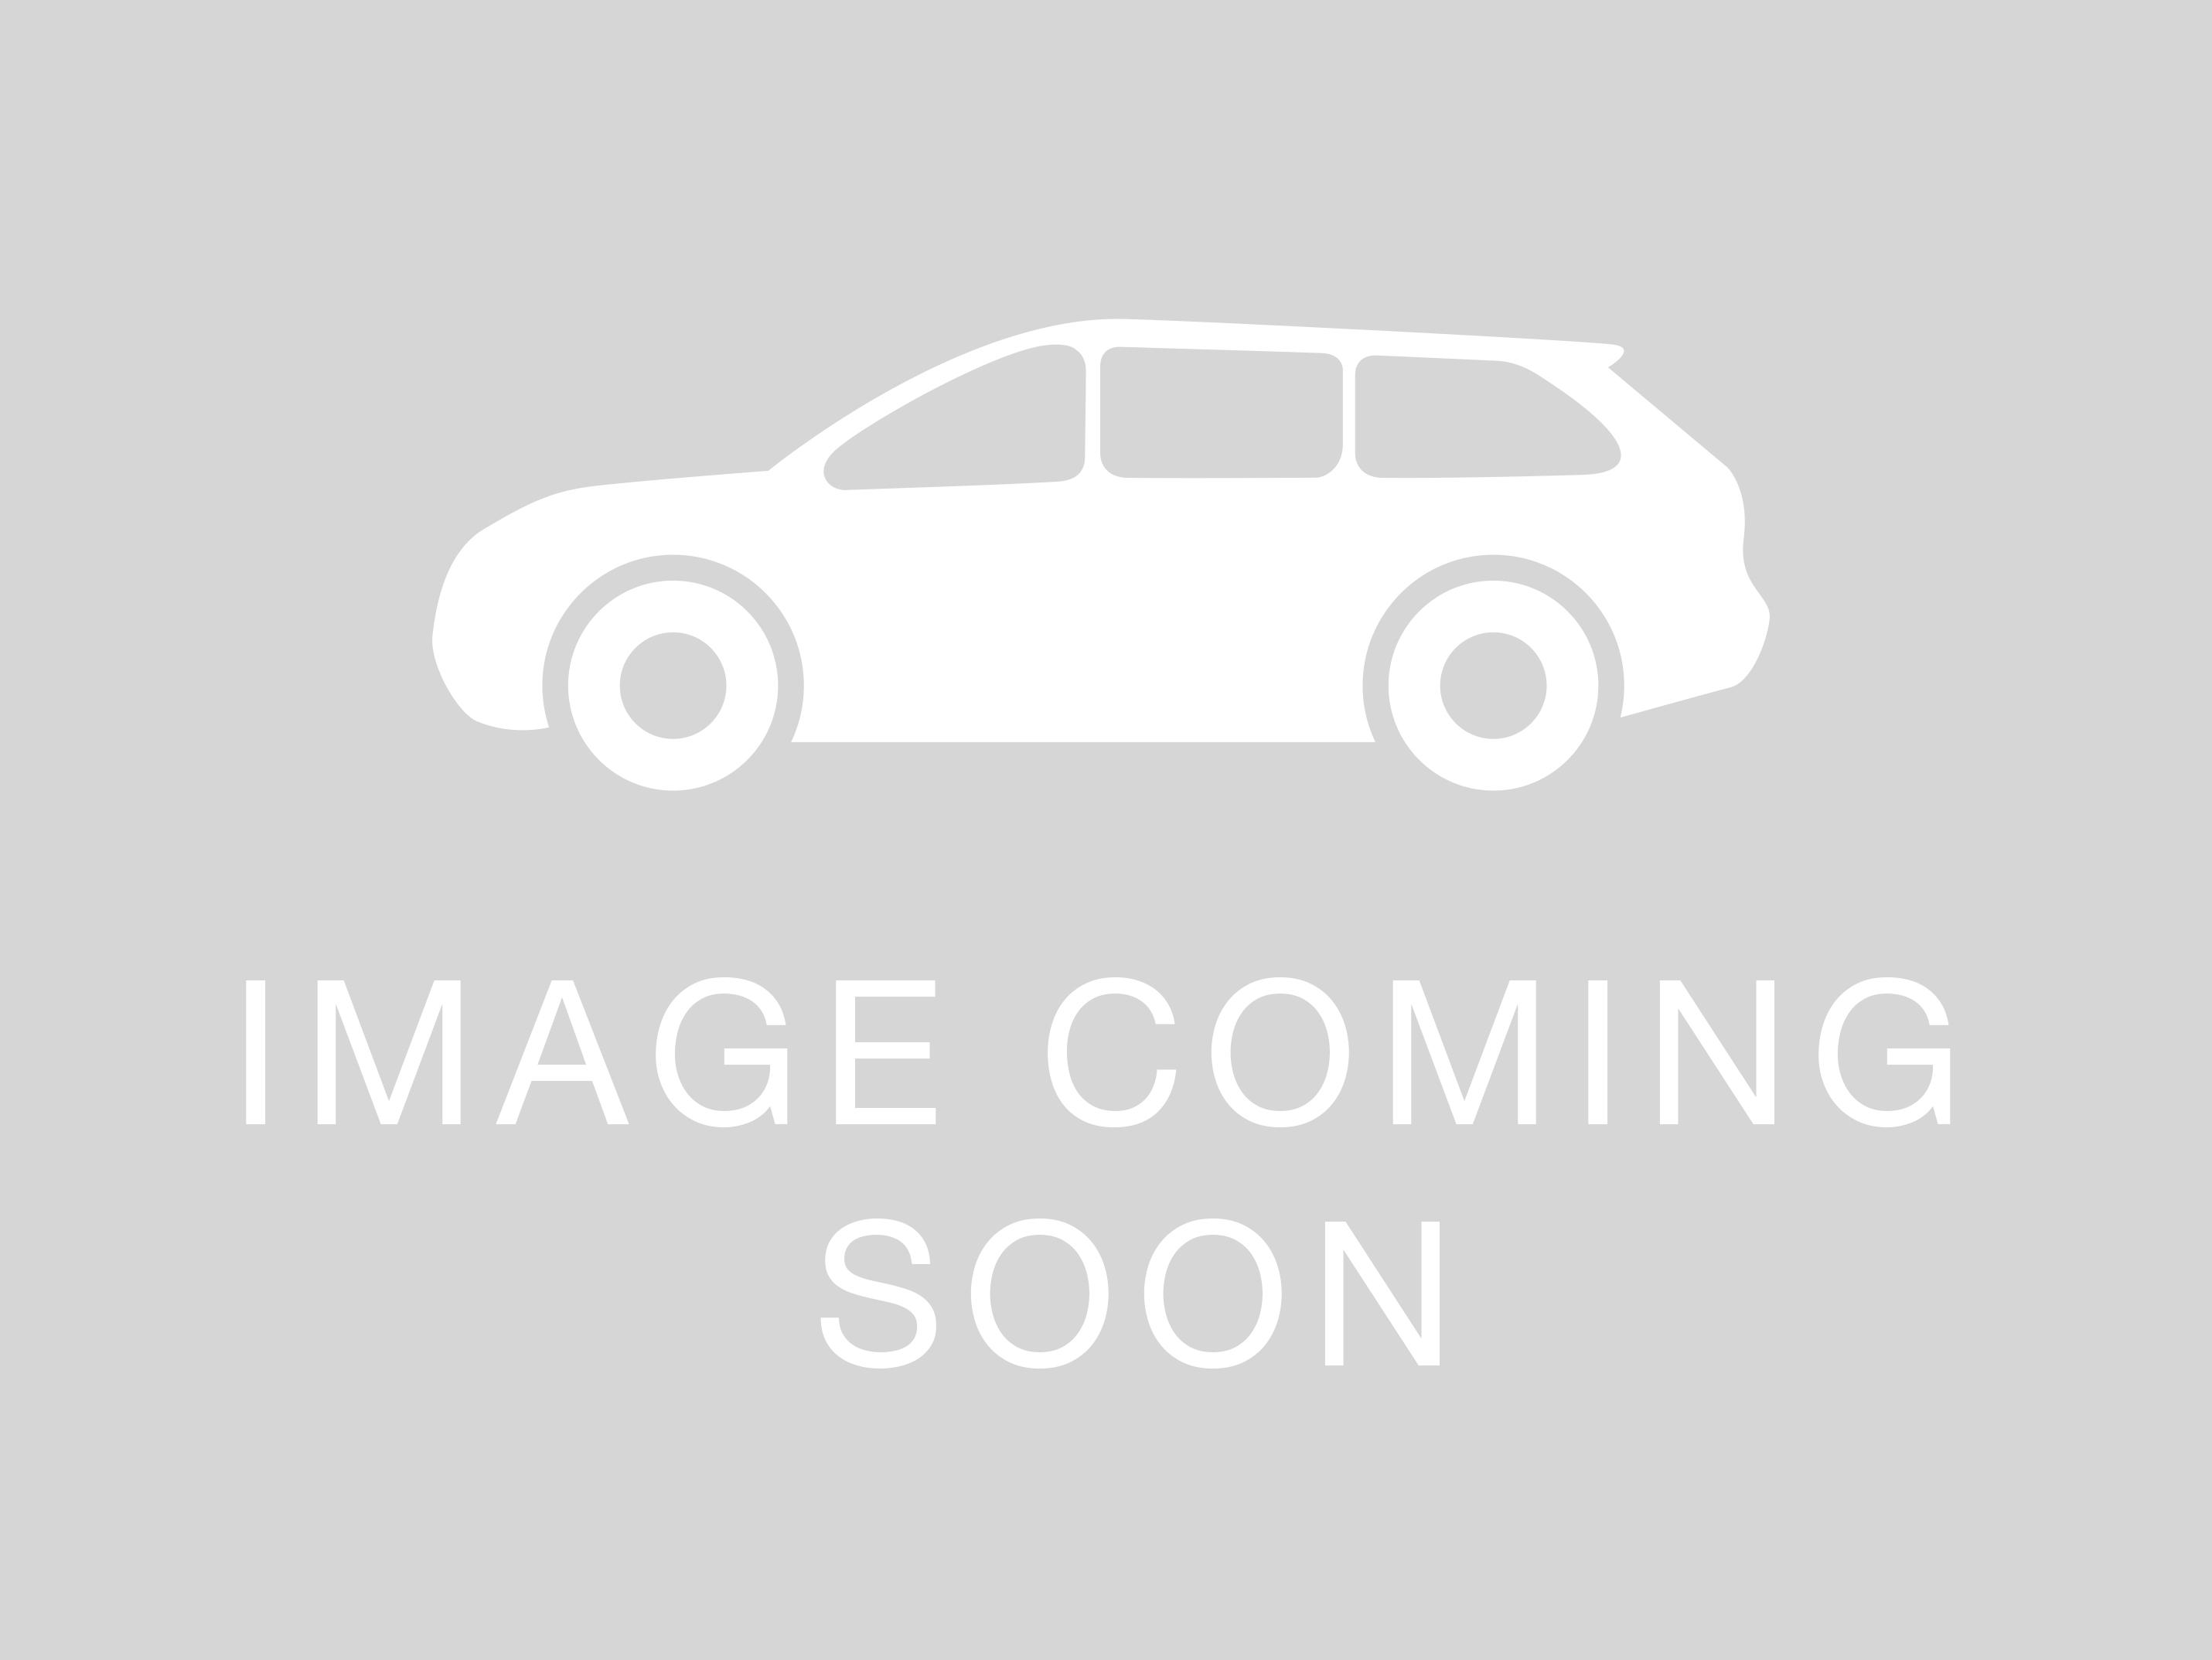 2017 Ford Focus. SALE & South Auckland Motors - New Zealandu0027s Biggest Ford and Mazda ... markmcfarlin.com